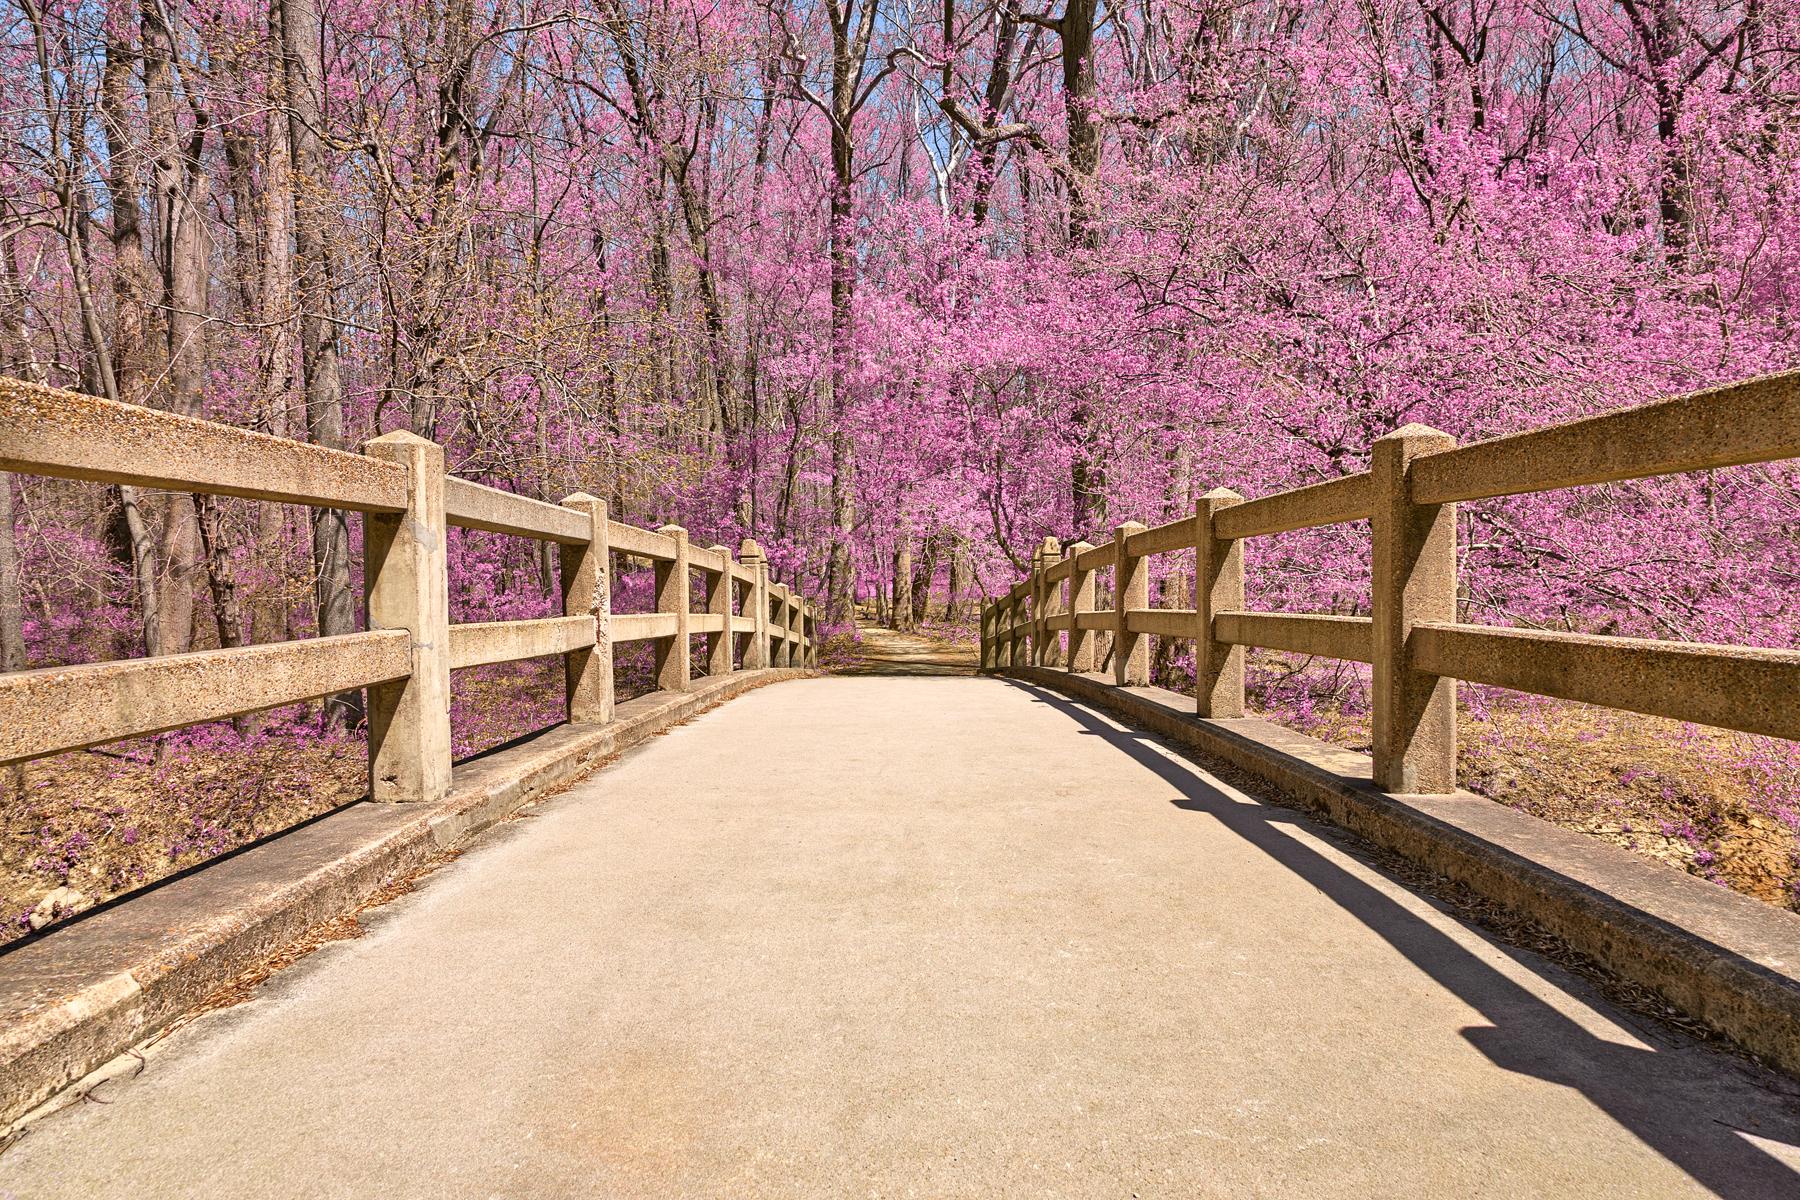 Bridge to pink paradise - hdr photo